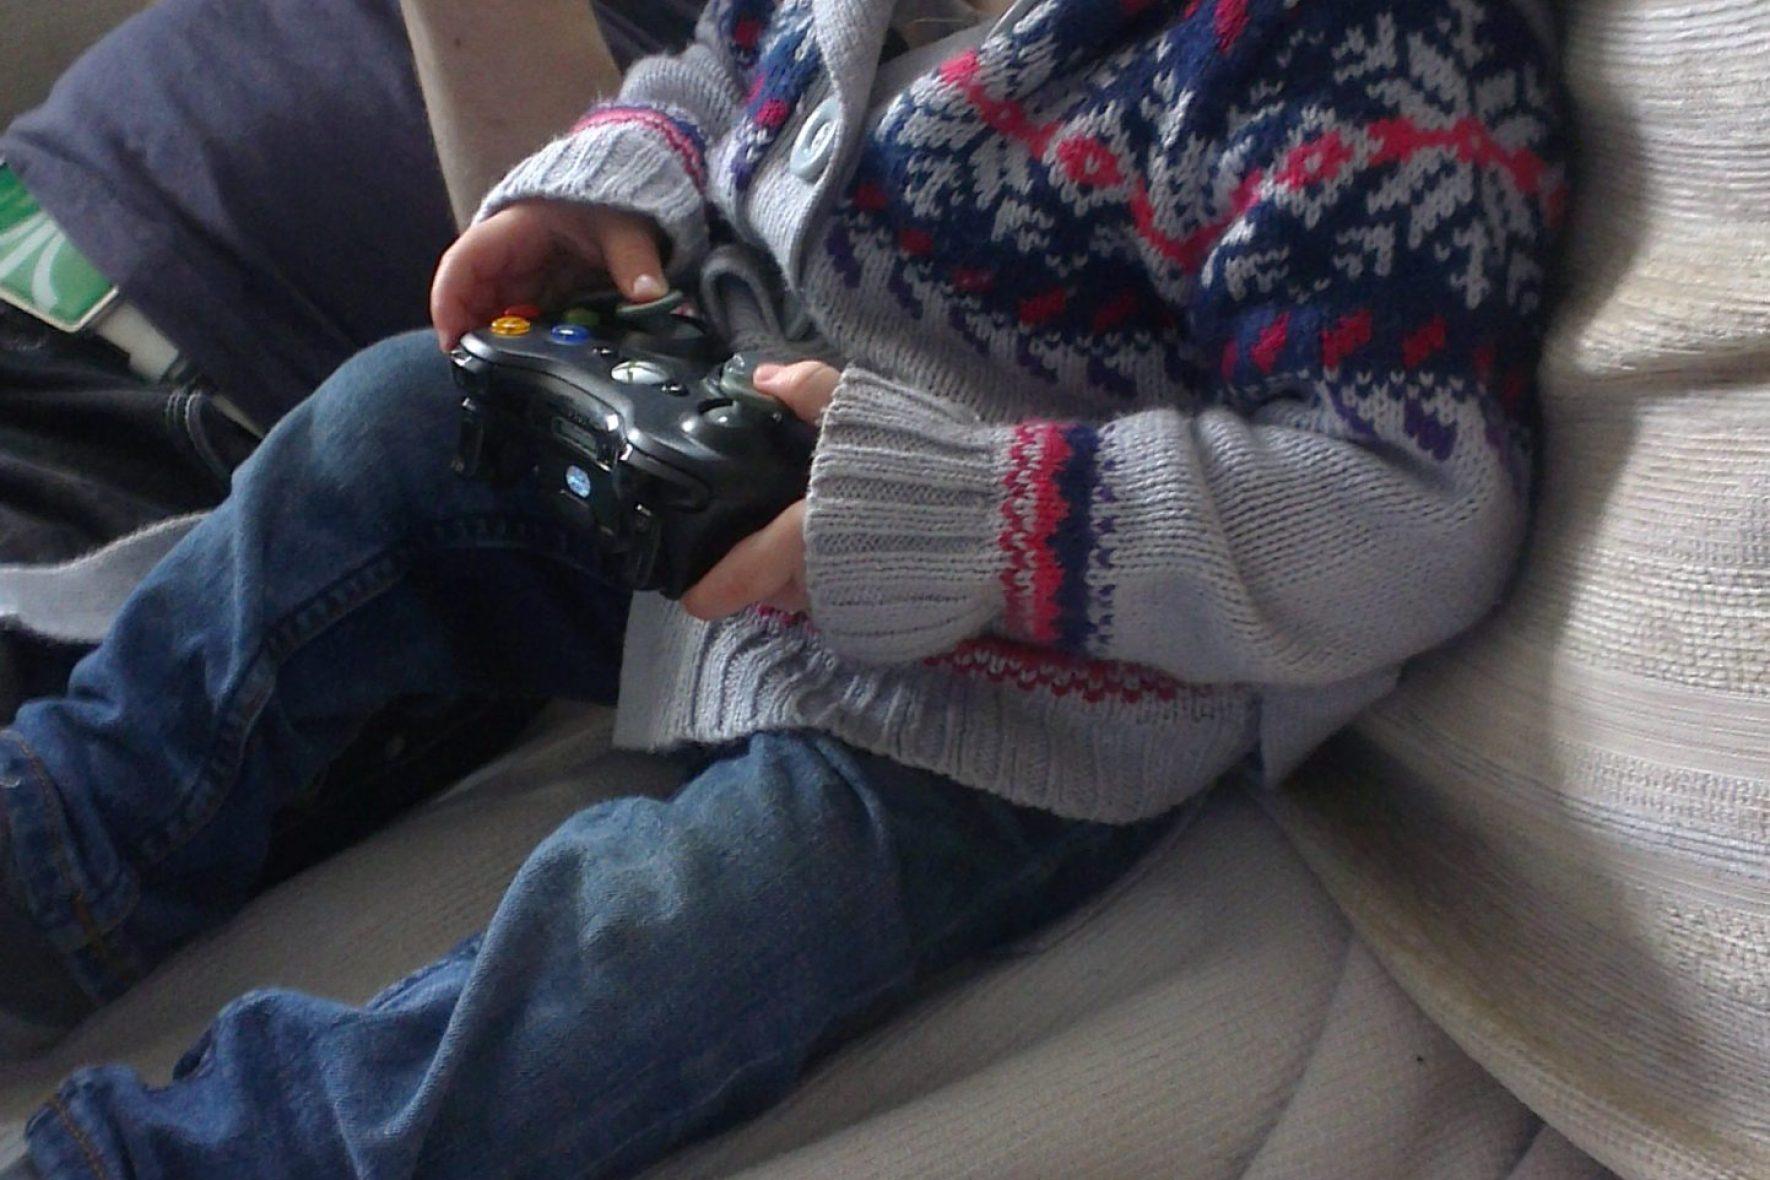 xbox 360, playing games, toddler gaming, Isabelle playing